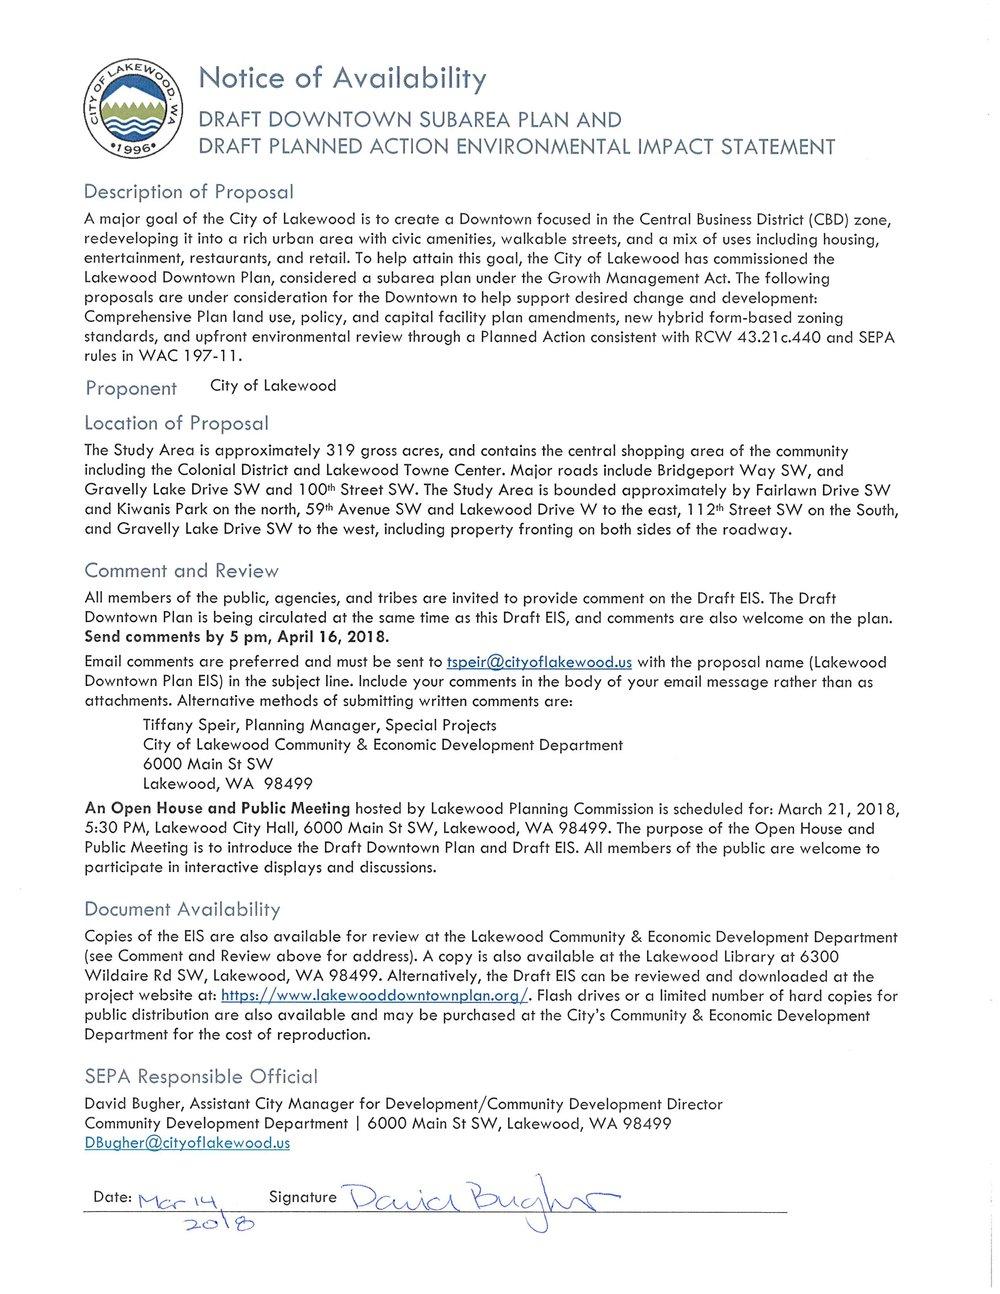 SEPA Notice of Availability